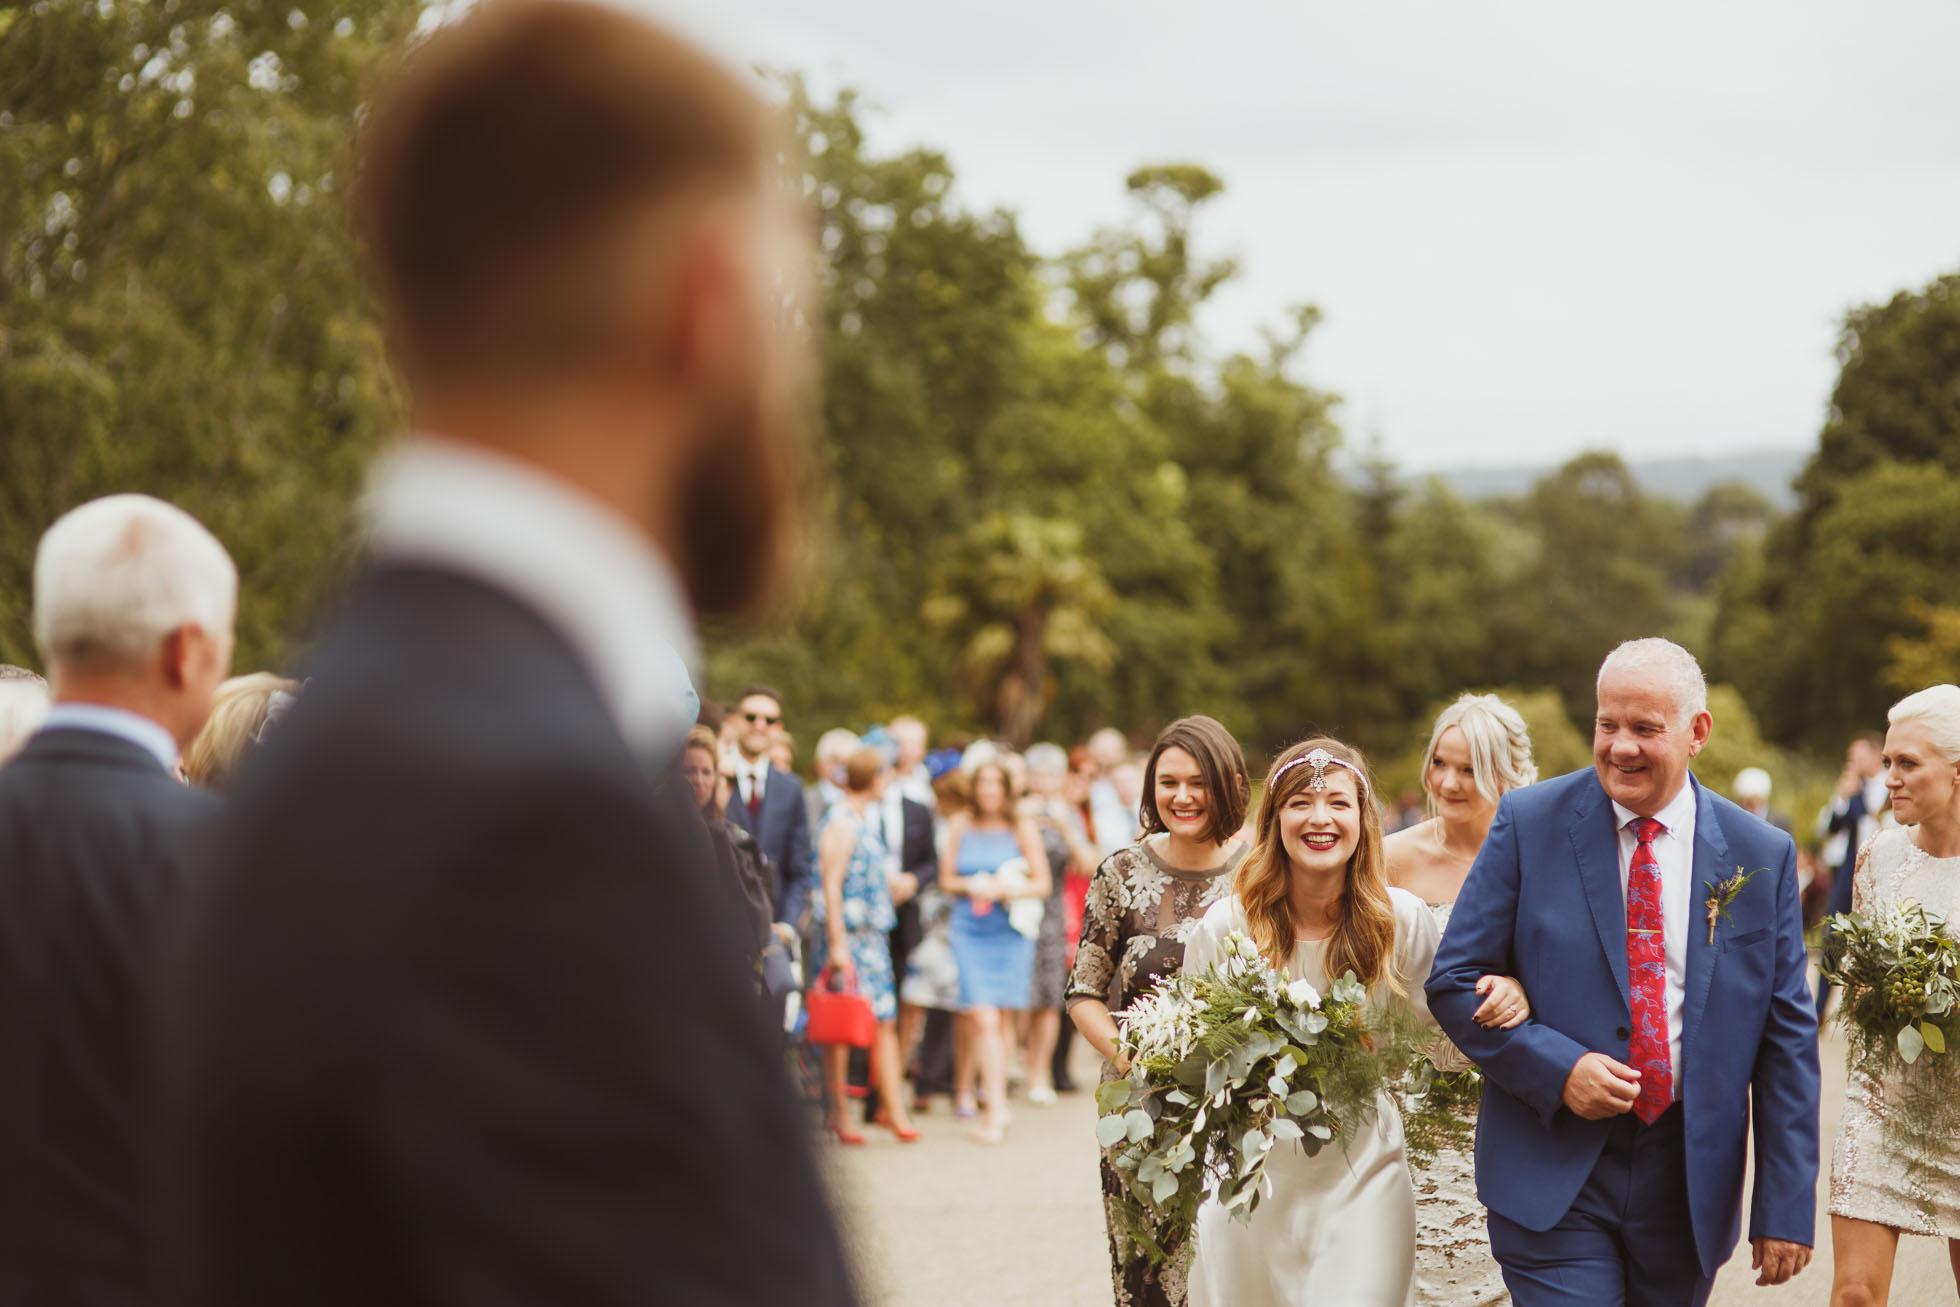 sheffield-botanical-gardens-wedding-photographer-21.jpg